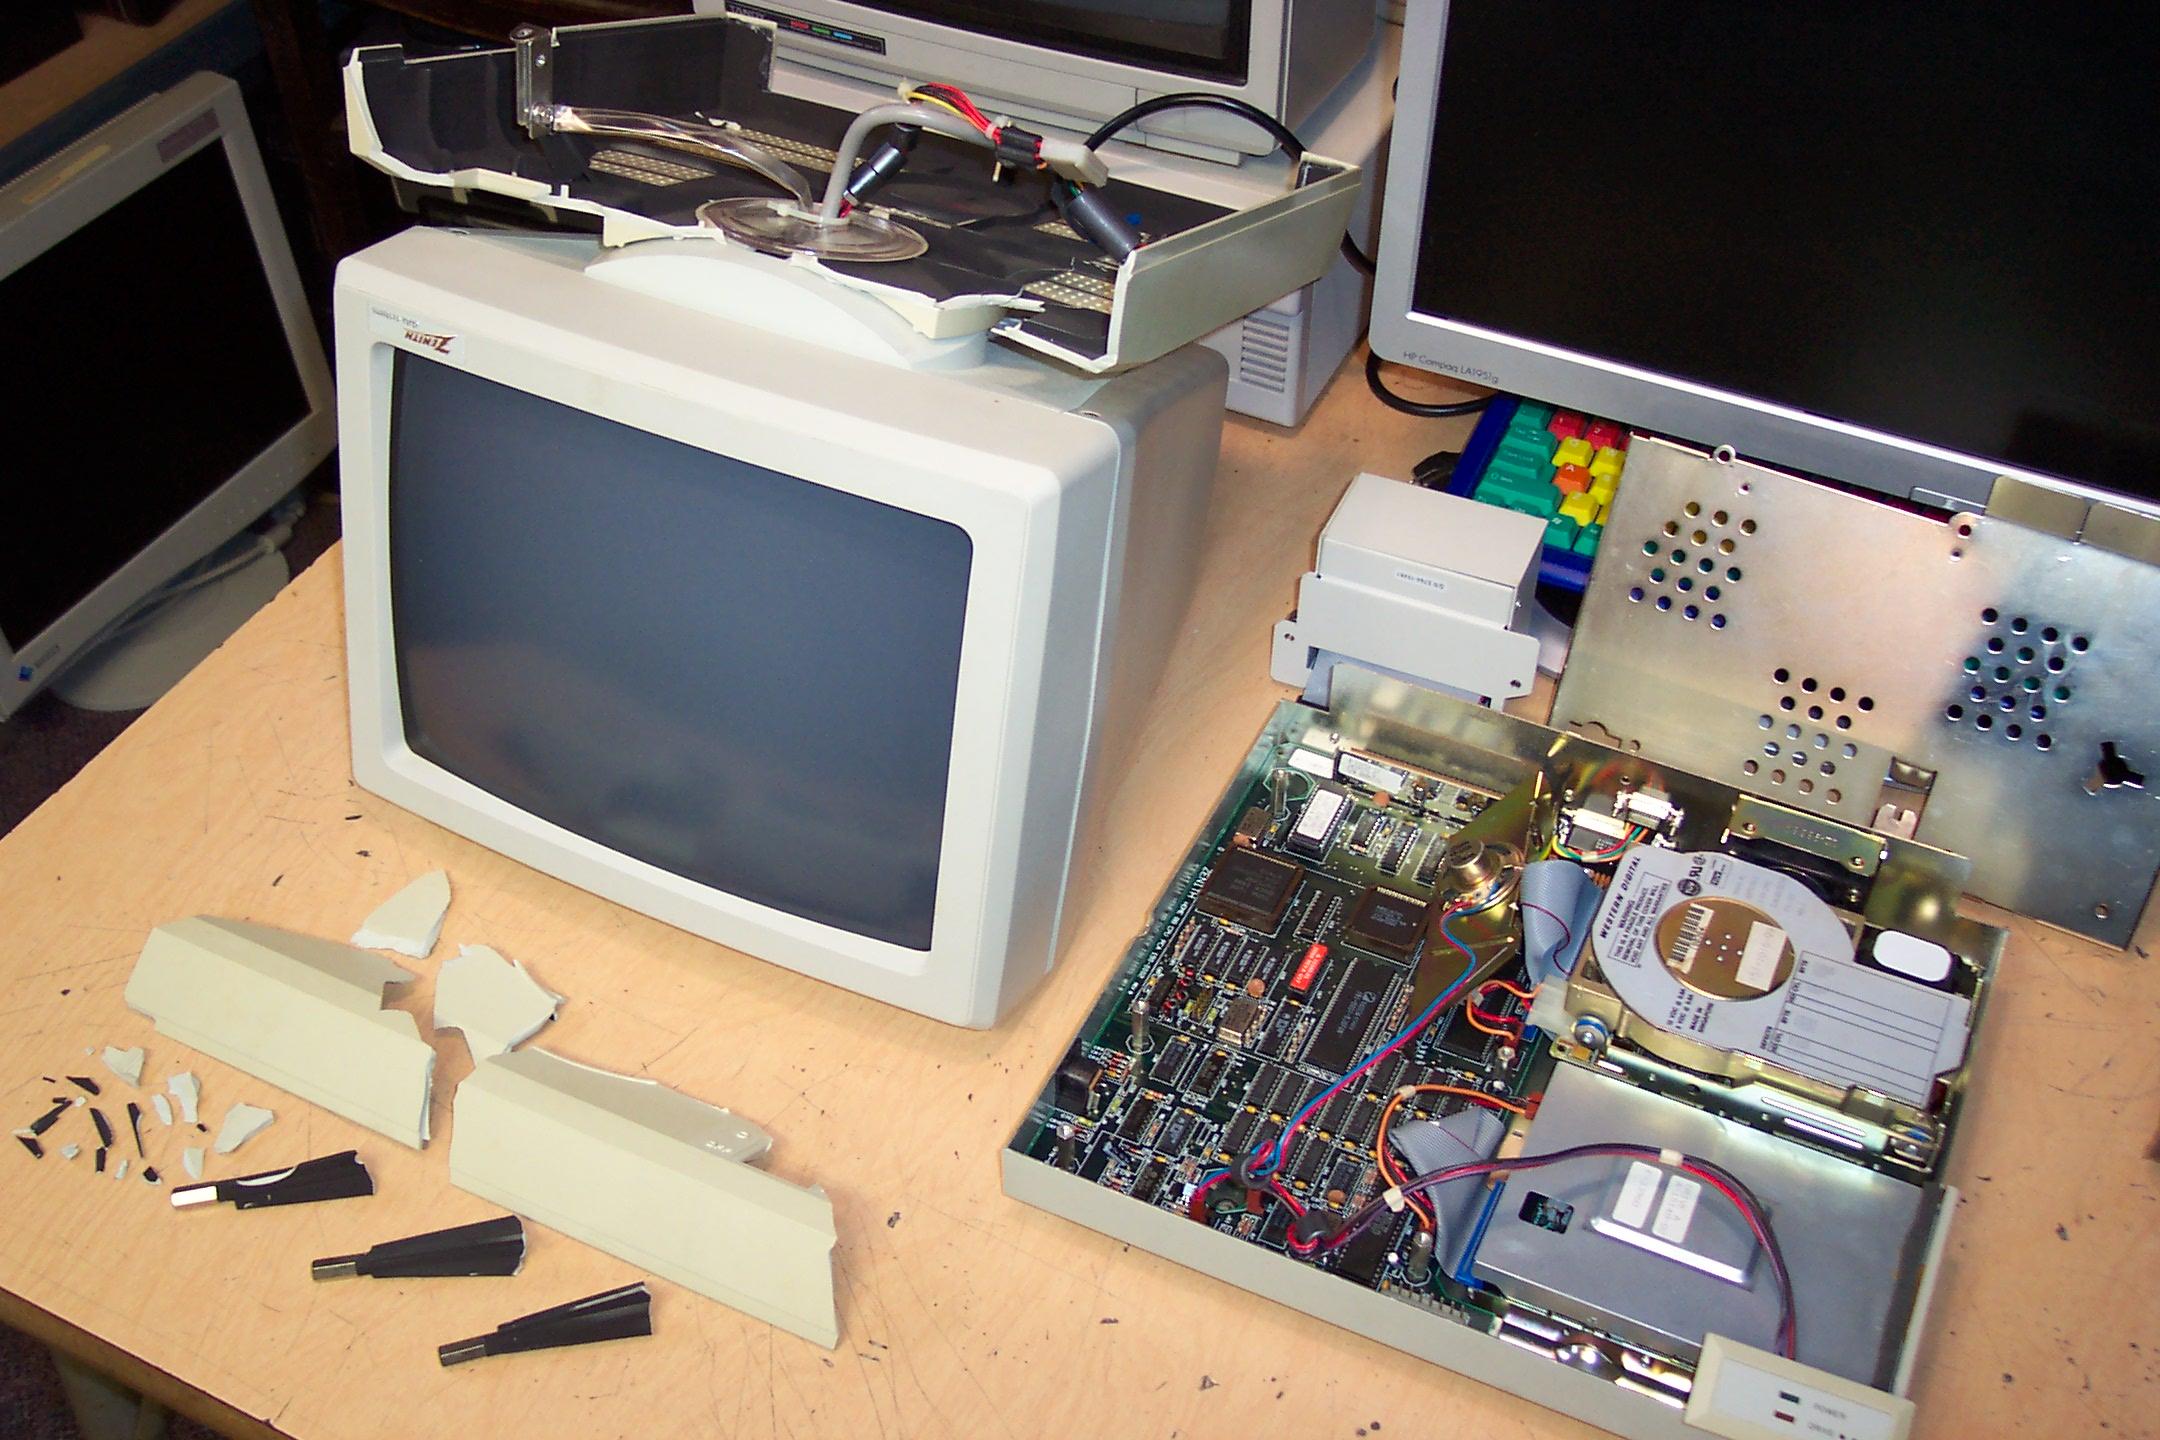 Zenith eaZy PC, not-so-easy repair